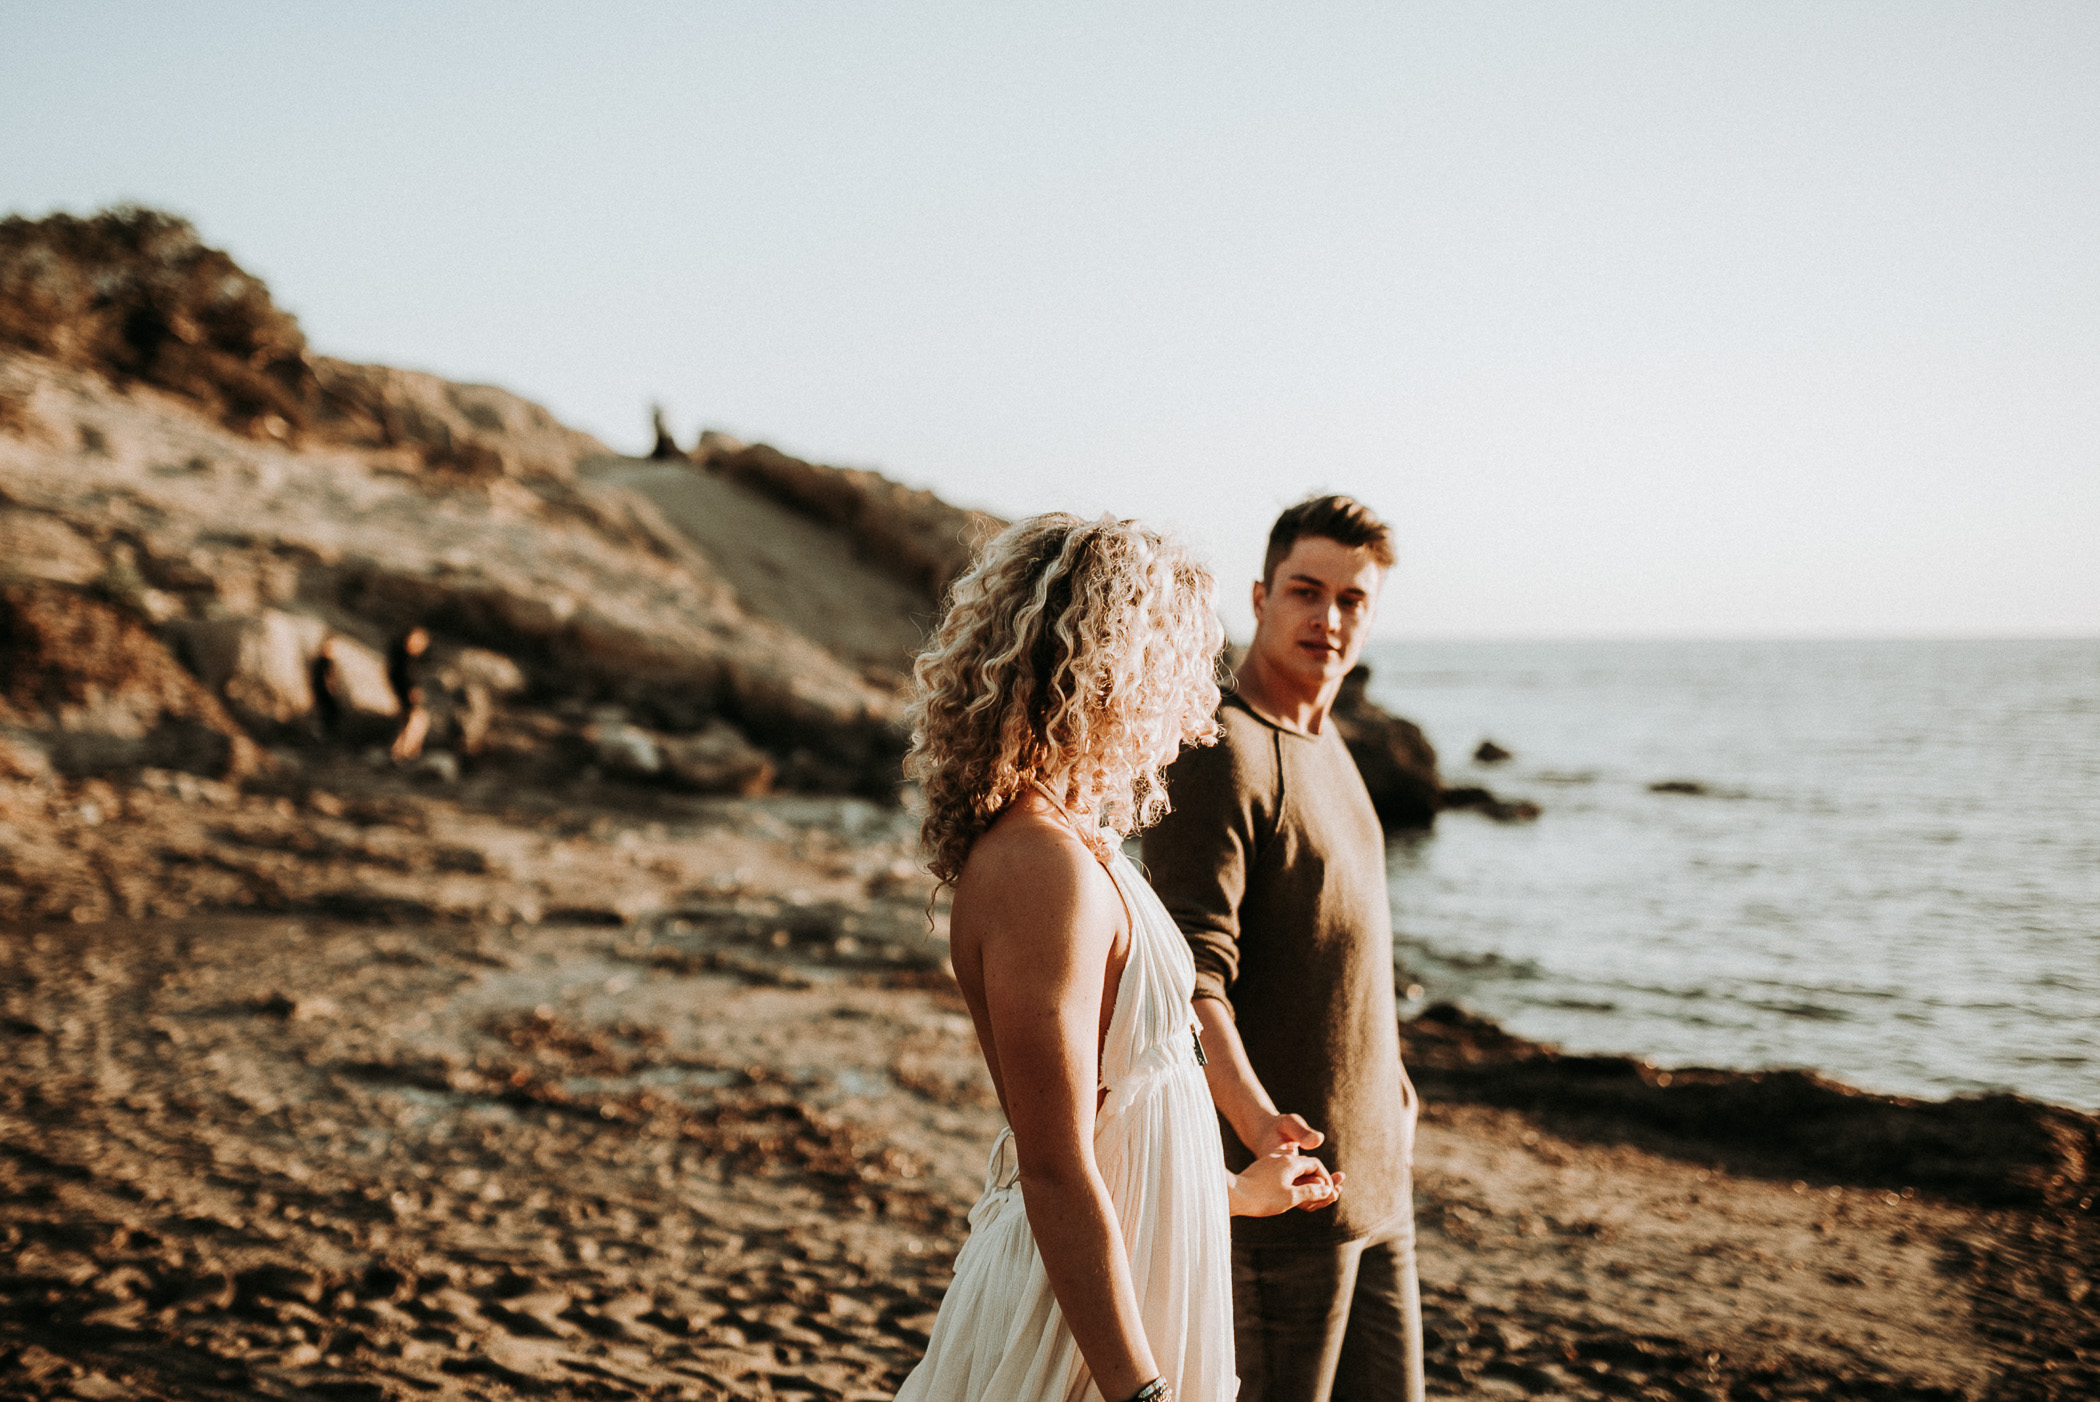 DanielaMarquardtPhotography_elopement_mallorca_spain_paguera_palma_charlyandbela_79